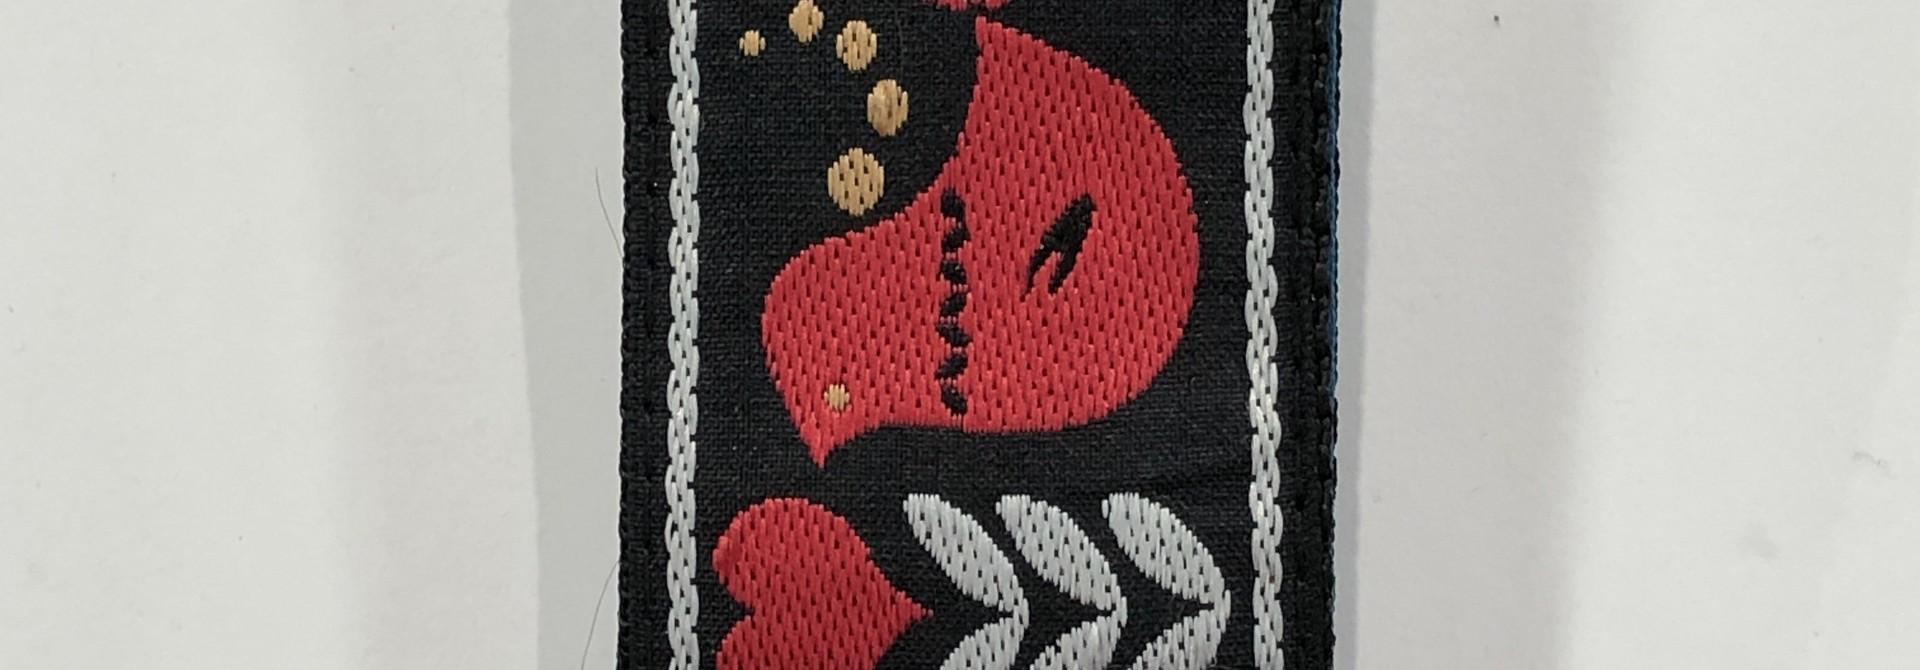 Redbird Rising Jacquard Strap P04667